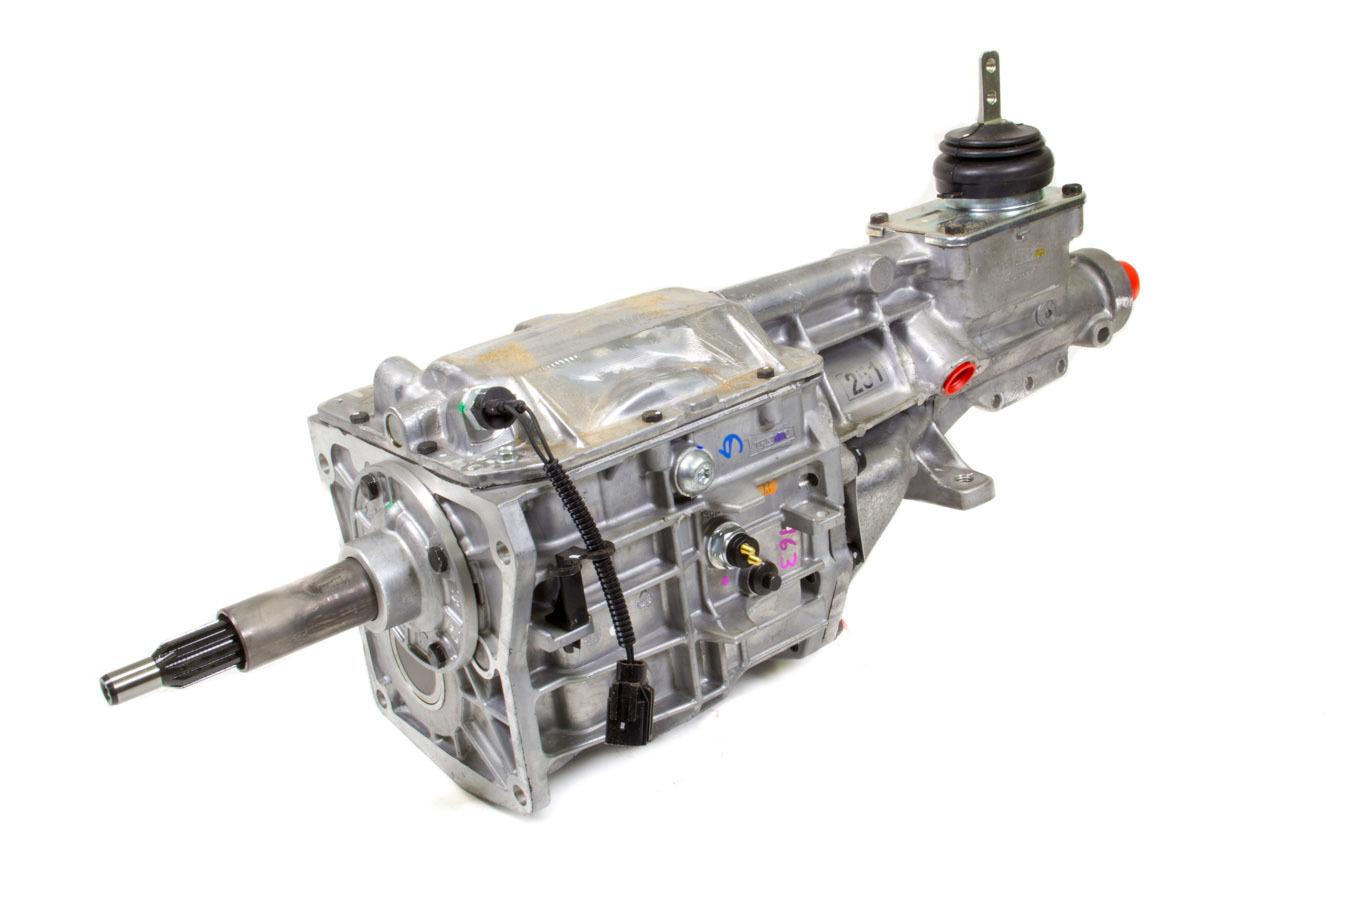 Tremec T-5 Ford World Class Transmission